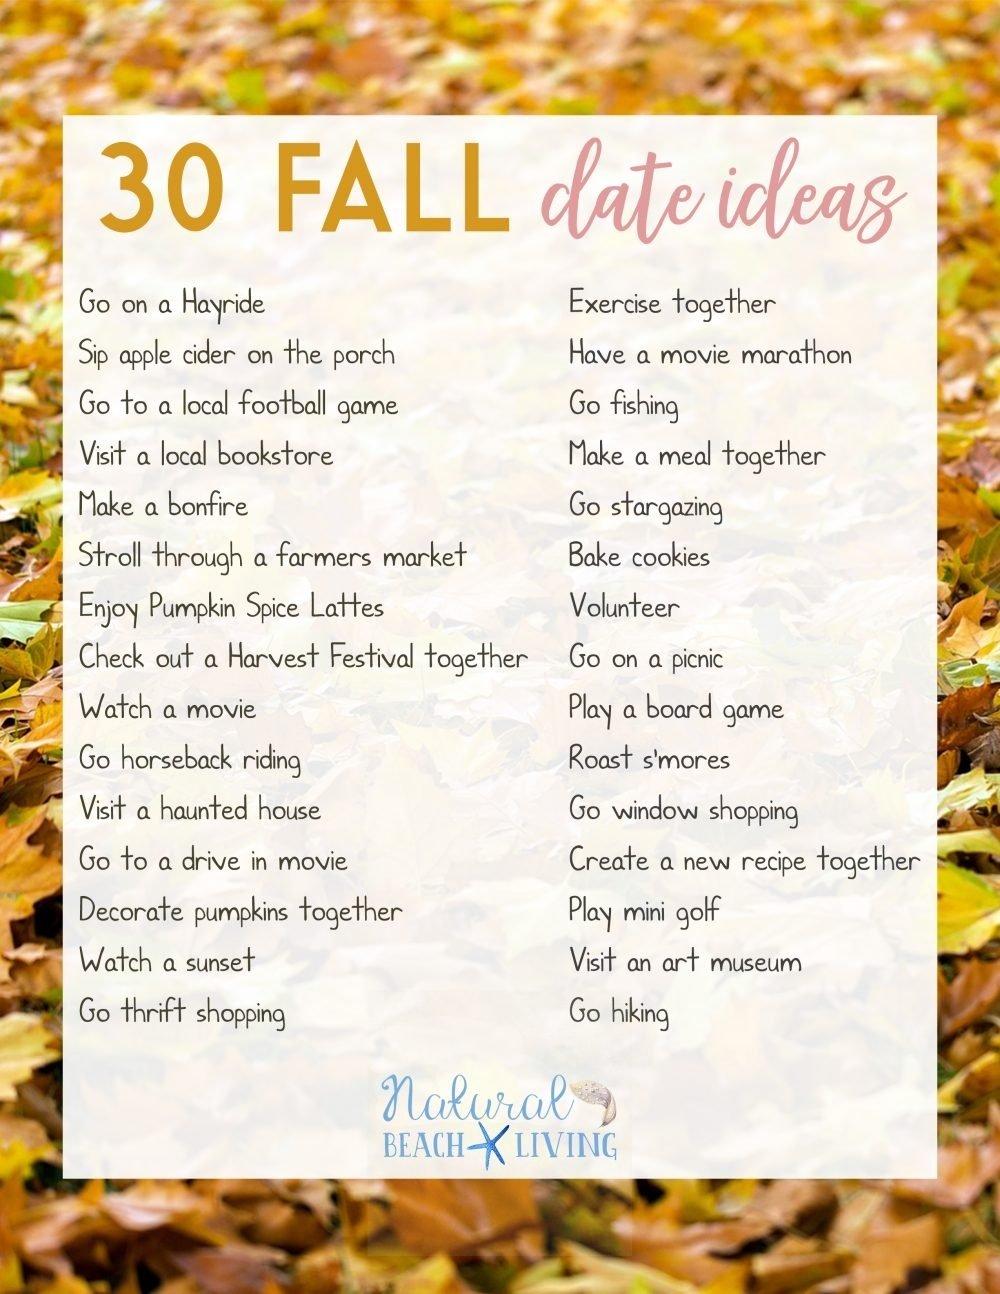 10 Famous Cheap Fun Date Night Ideas fun date night ideas for fall natural beach living 13 2020